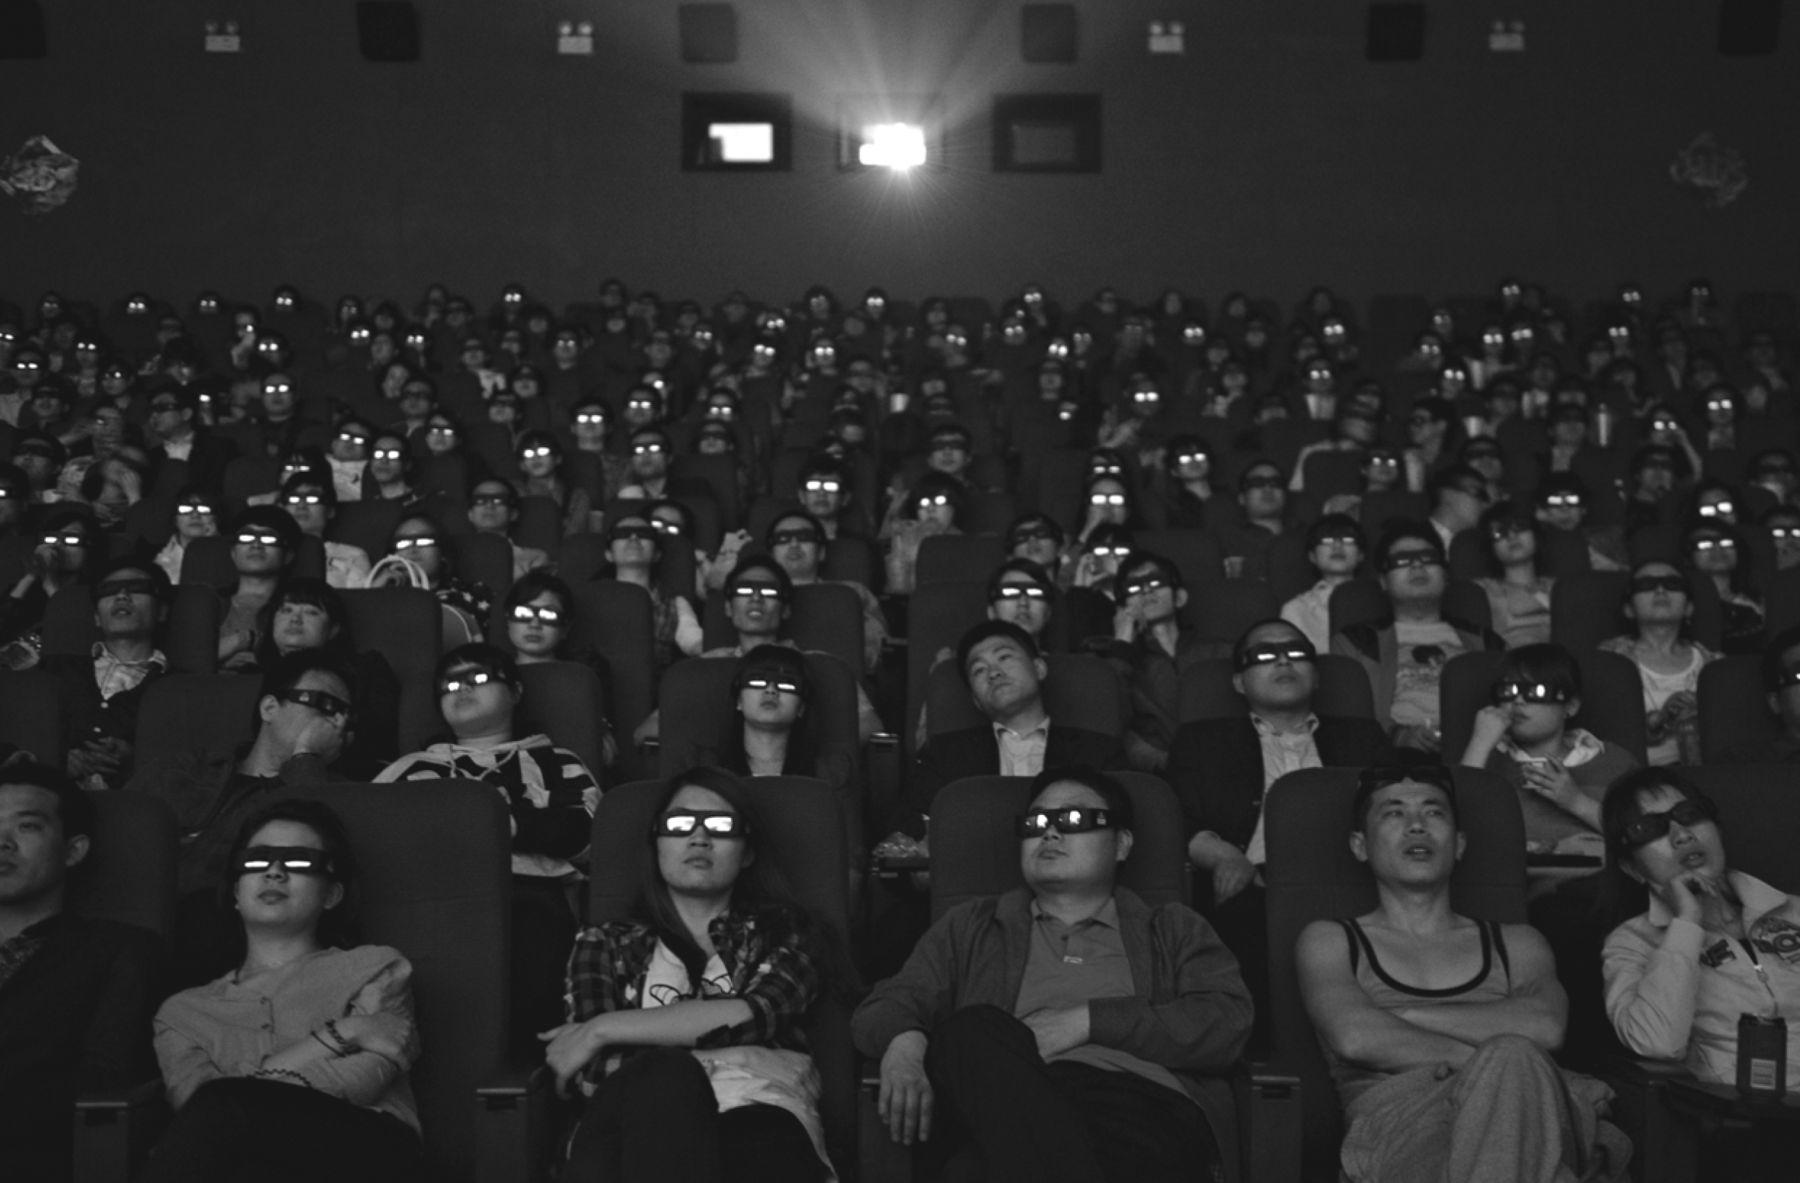 Movie-goers watching  Titanic 3D , Taiyuan, Shanxi province, 2012. Photo: Reuters